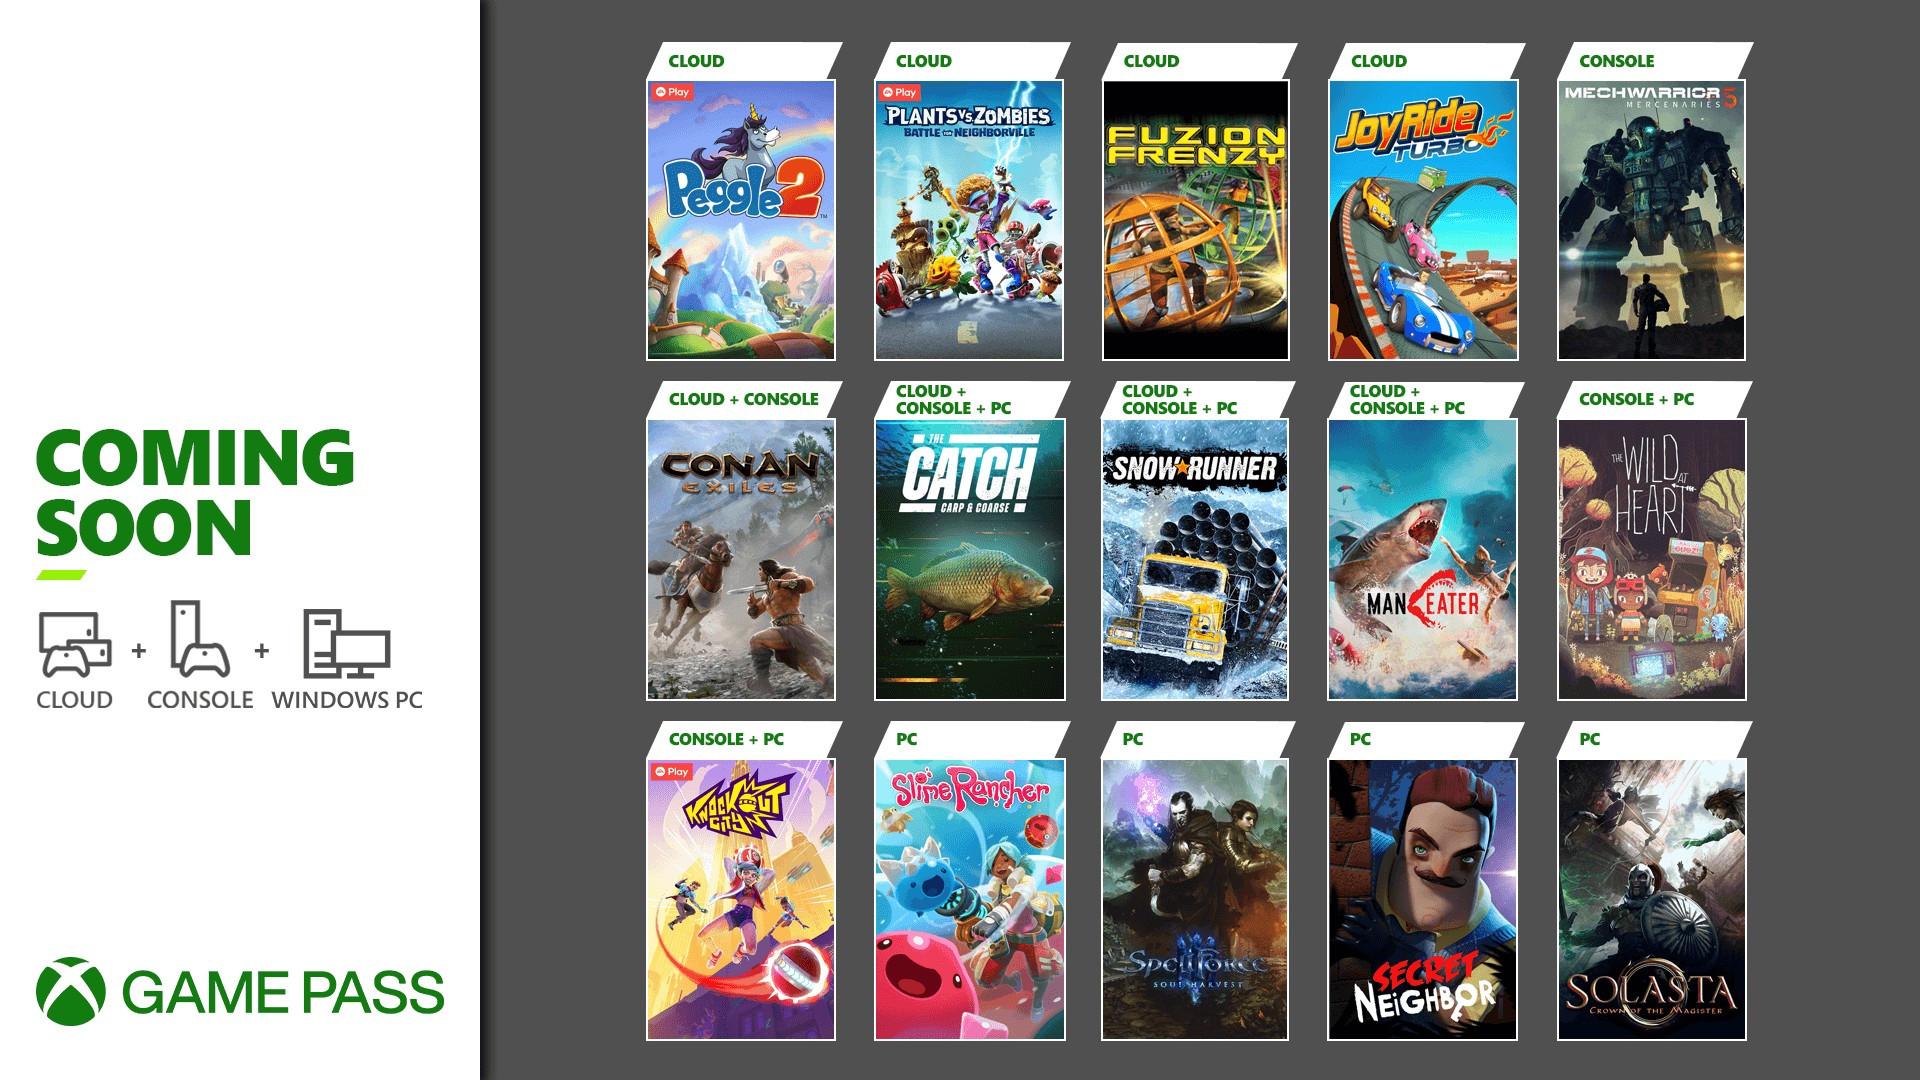 Xbox Game Pass Additions - Maneater, Plants vs. Zombies: Battle for Neighborville, MechWarrior 5: Mercenaries & More